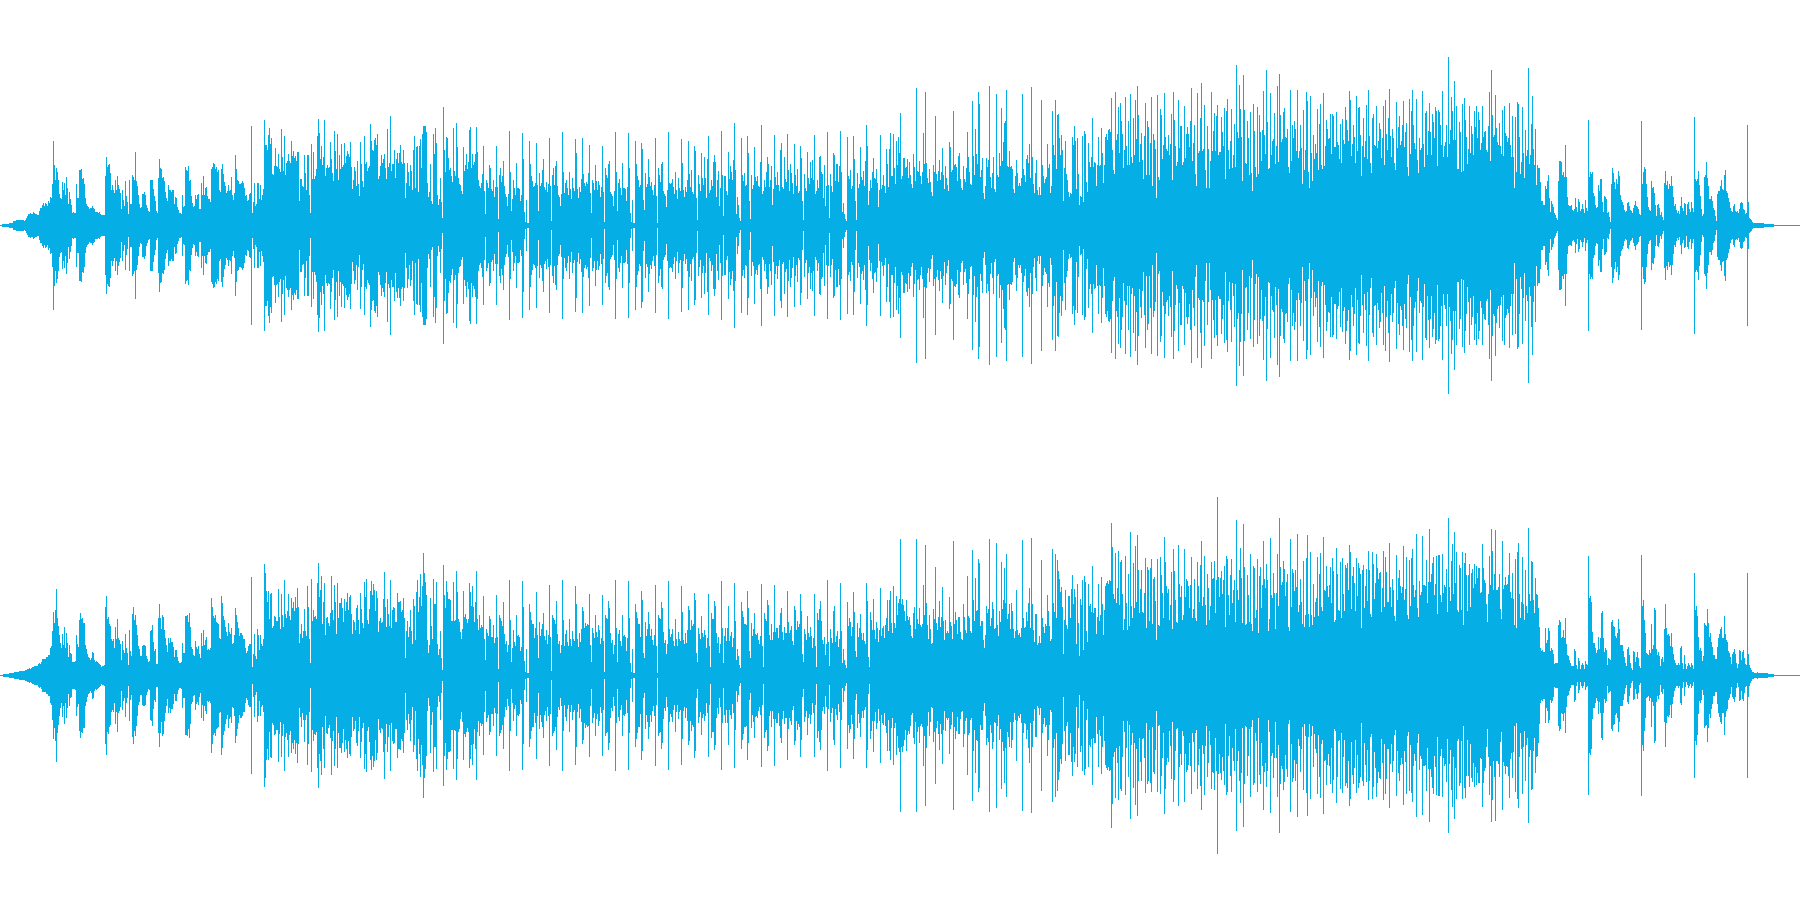 city pop、jazz、チップの再生済みの波形